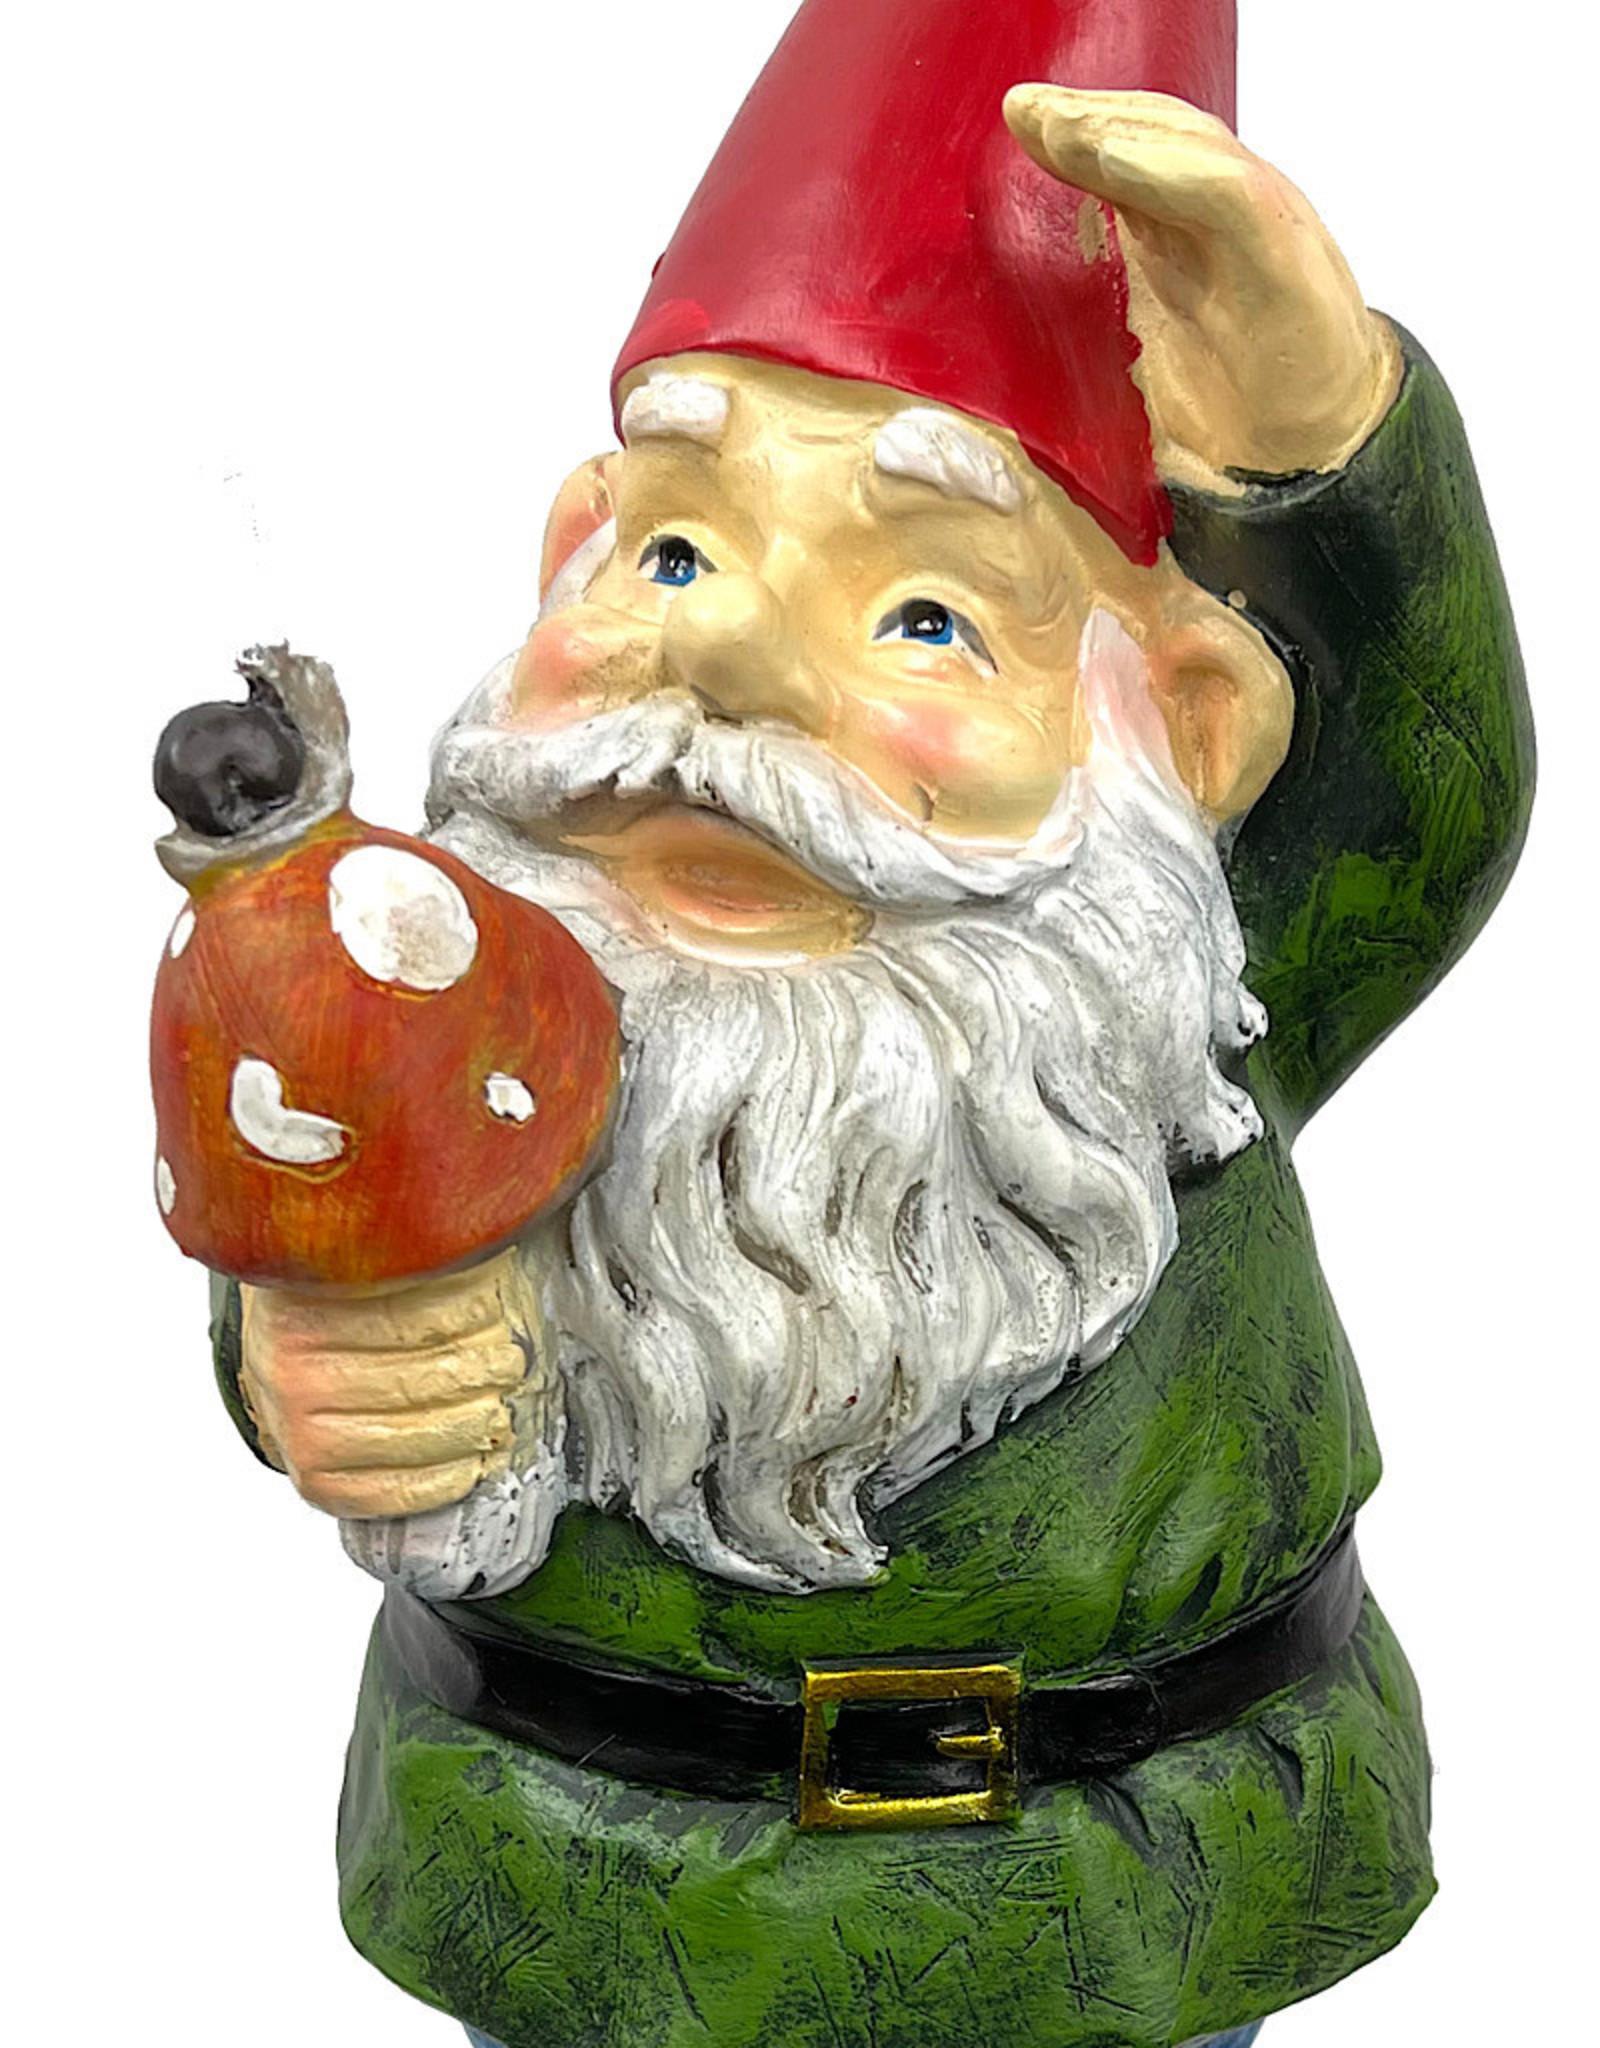 Garden Gnome With Mushroom